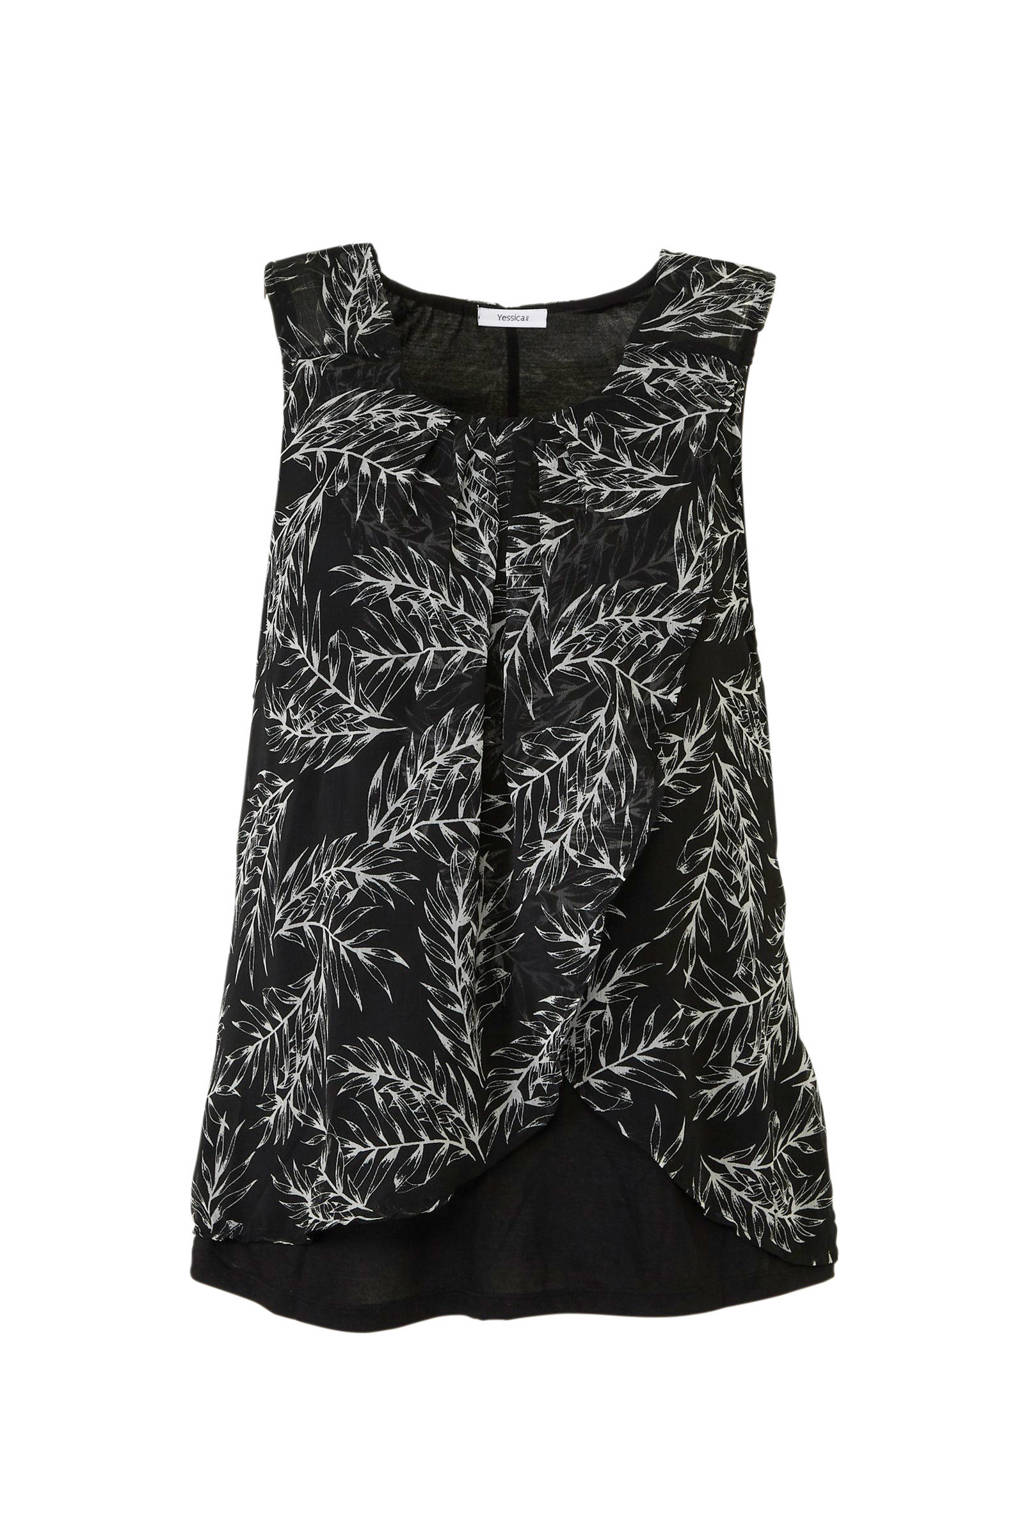 C&A XL Yessica semi-transparante top met overslag, Zwart/wit